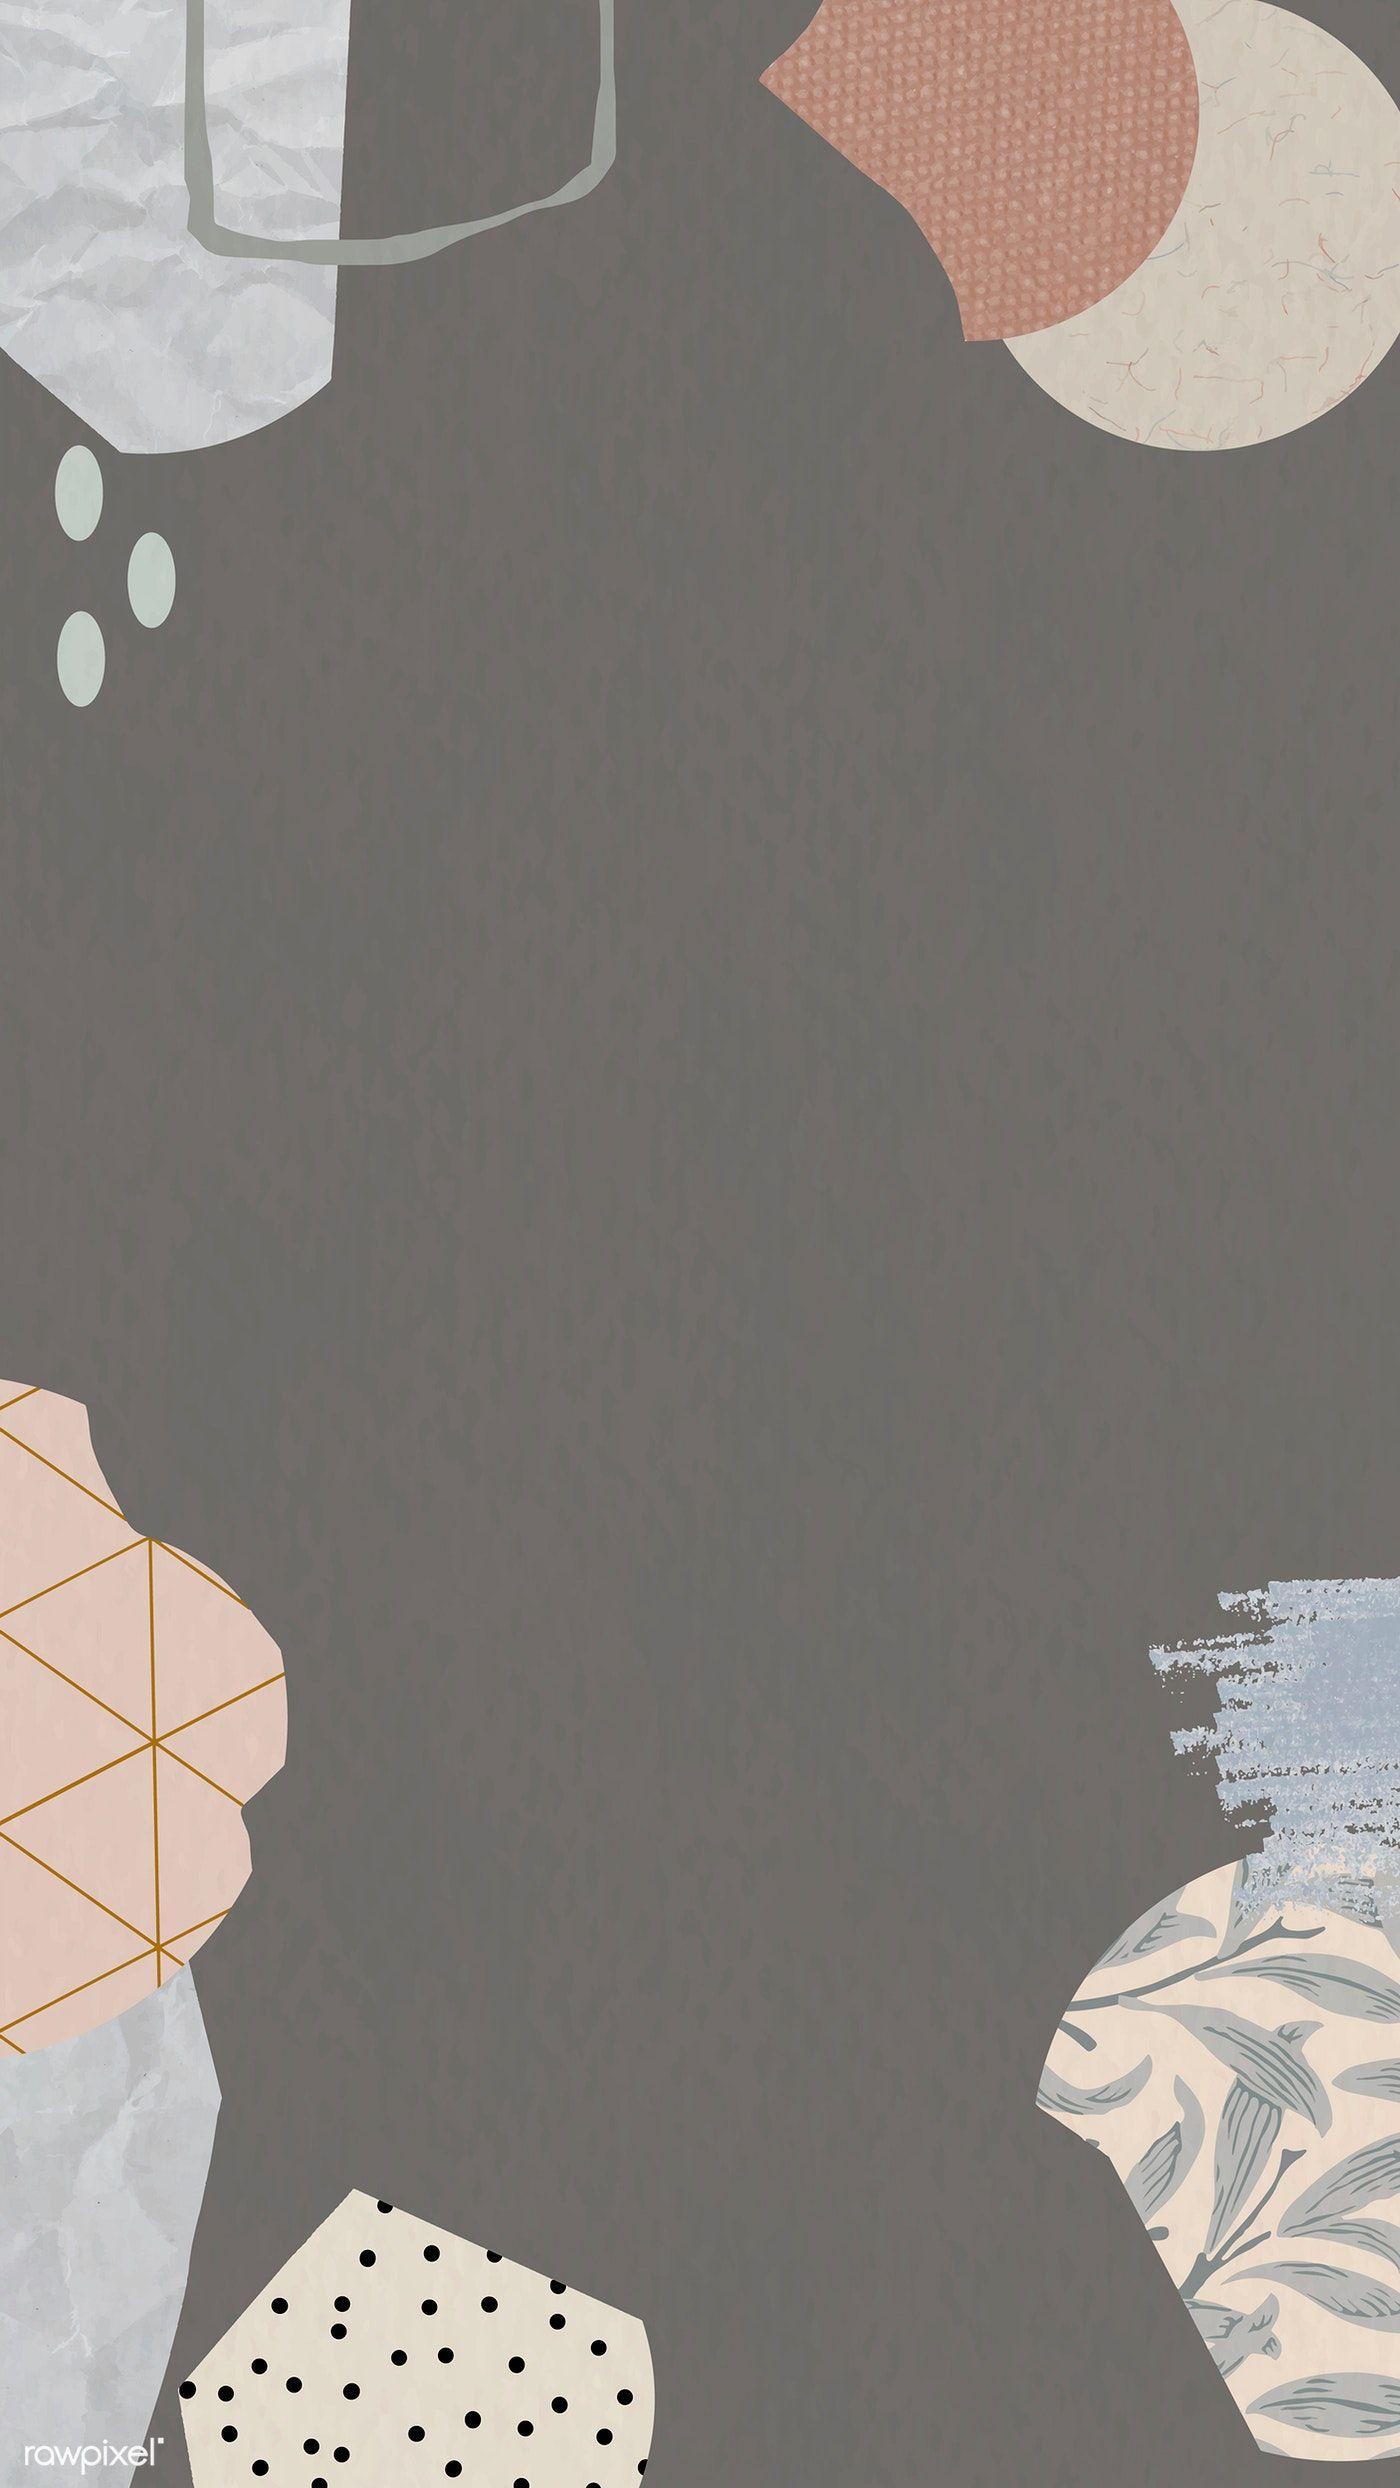 Download premium vector of Brown terrazzo patterned mobile phone wallpaper